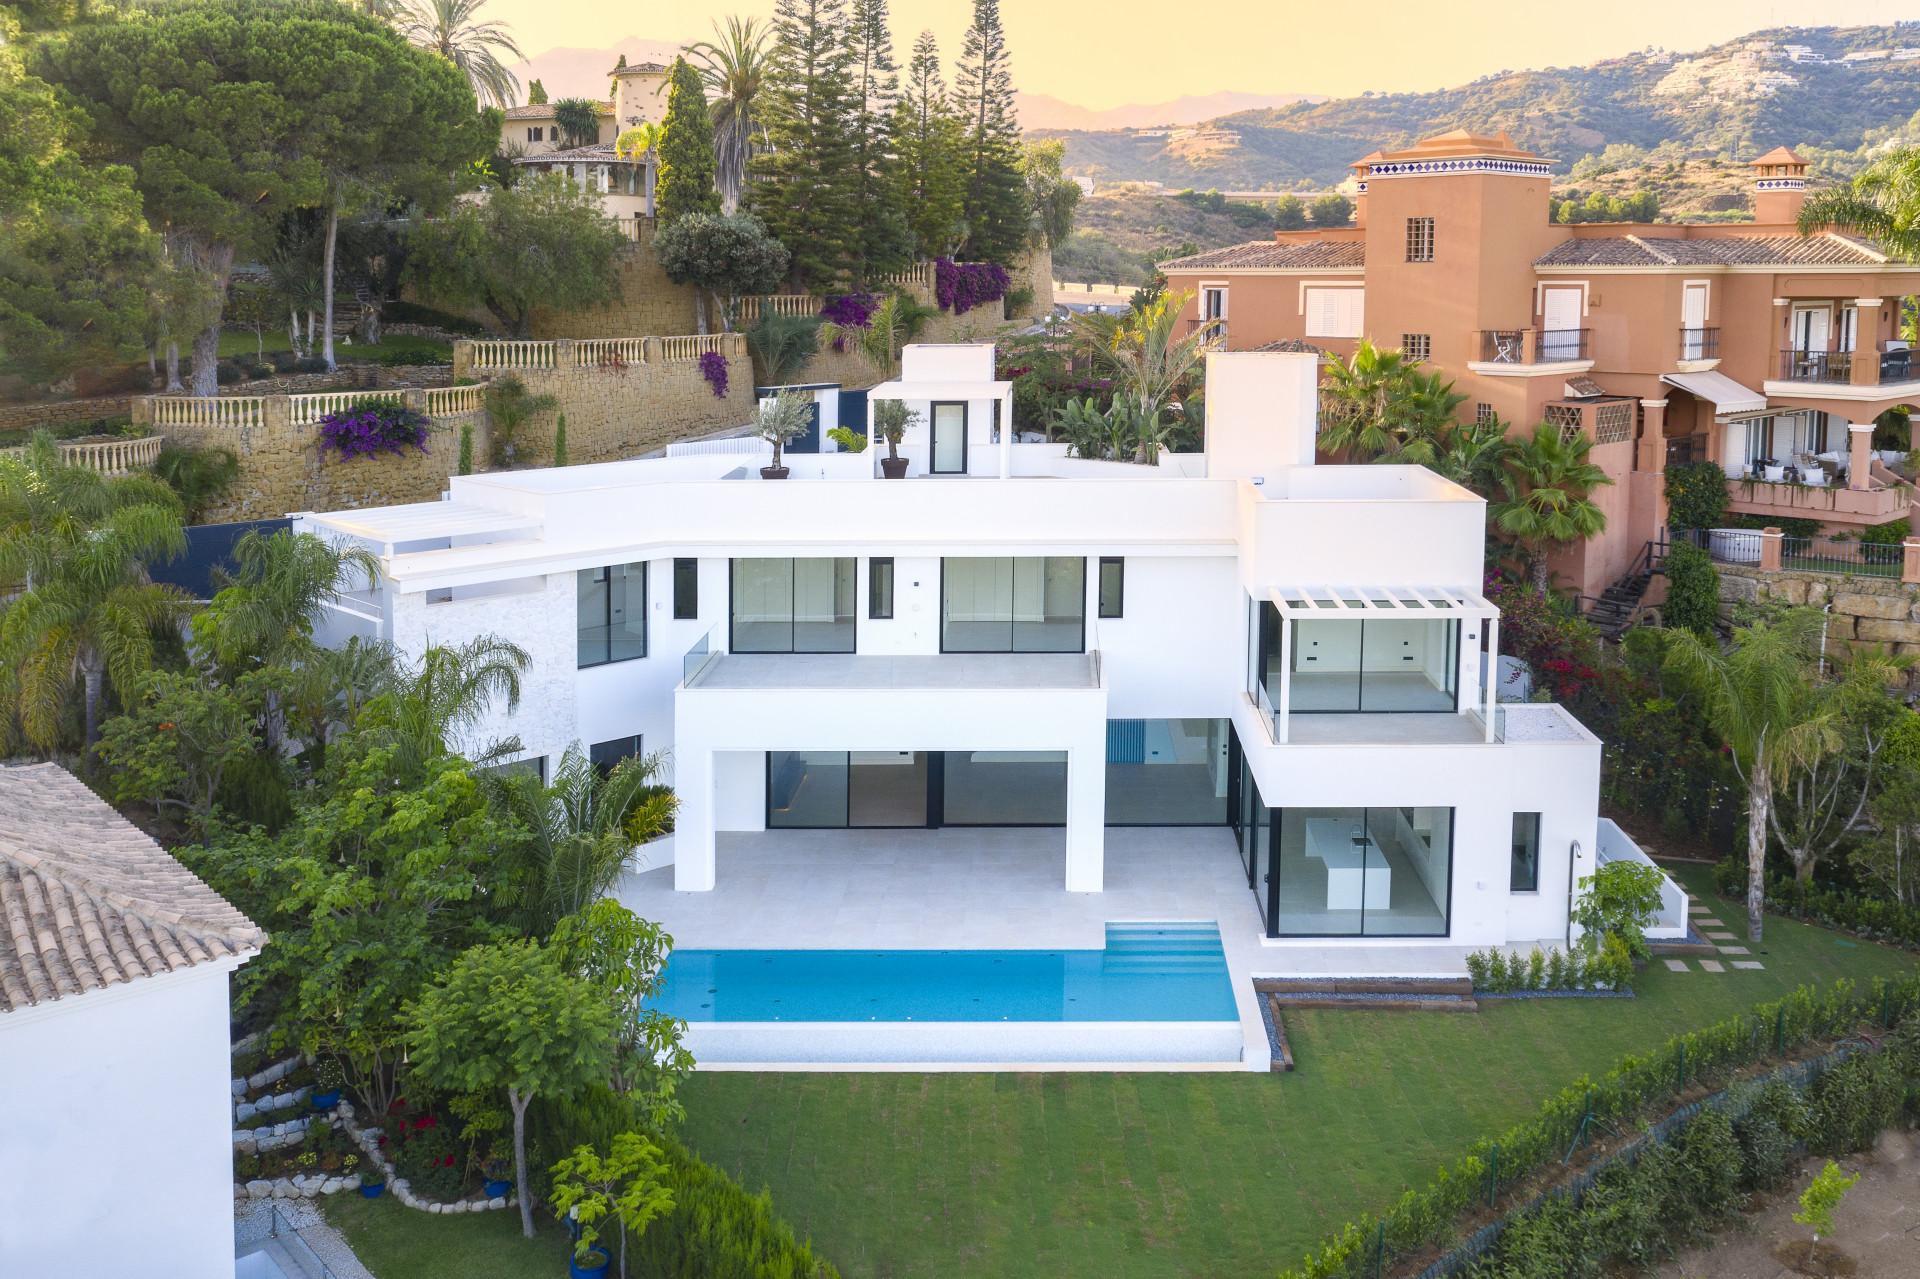 ARFV2193 Neue moderne Villa zum Verkauf in Rio Real, Marbella mit spektakulärem Meerblick